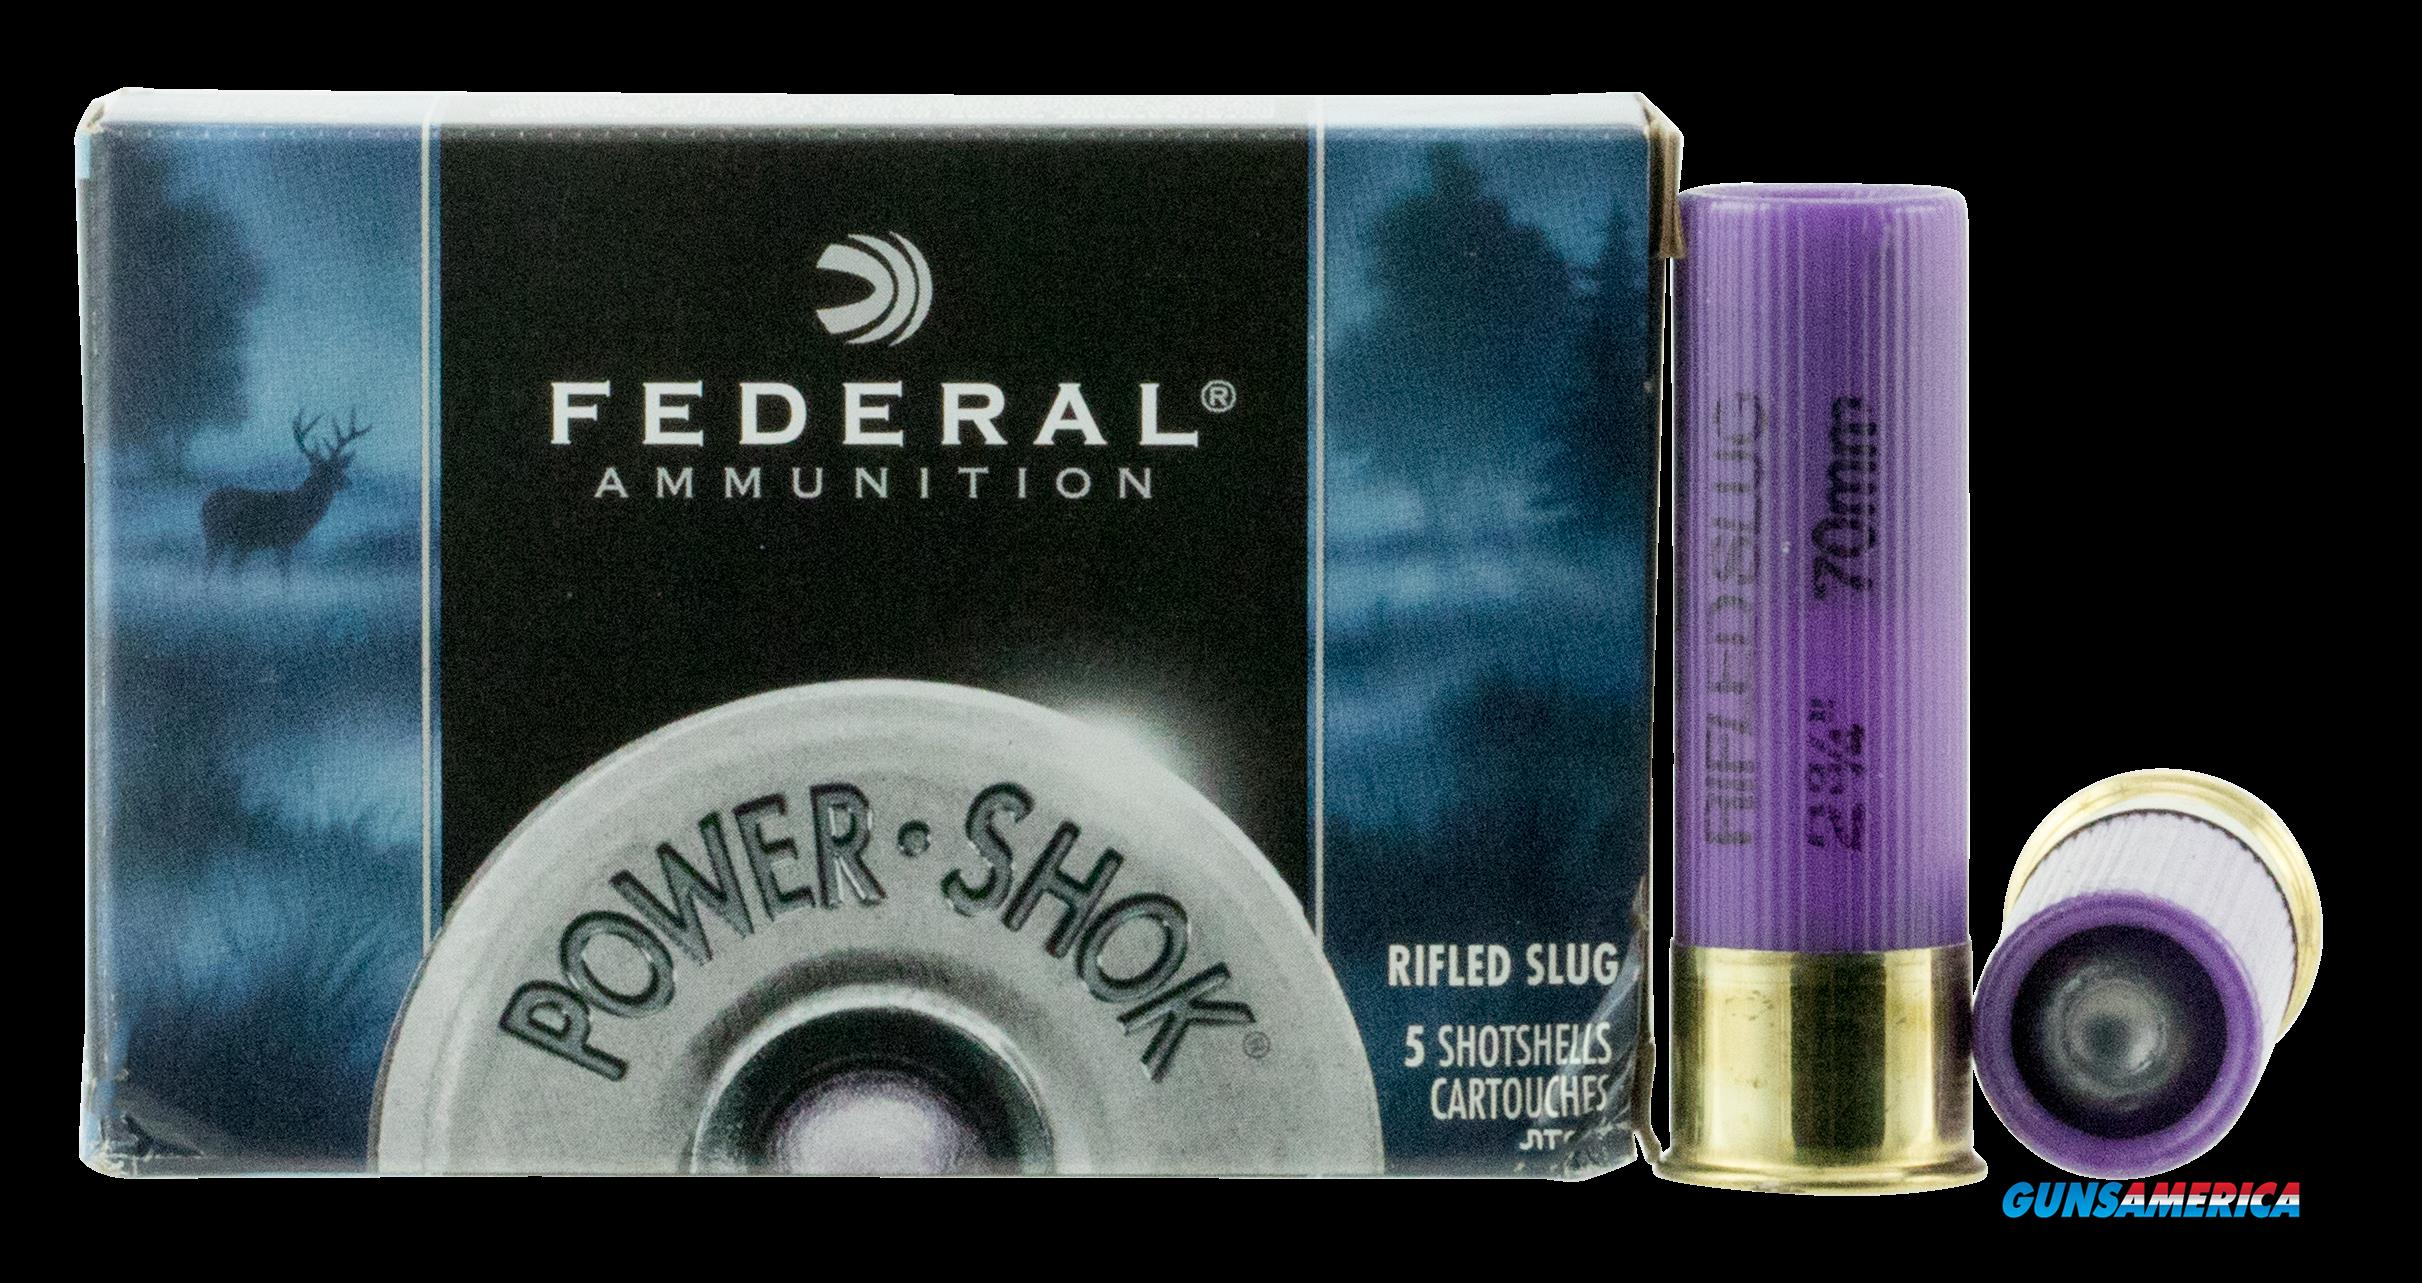 Federal Power-shok, Fed F164rs            16         Slug      5-50  Guns > Pistols > 1911 Pistol Copies (non-Colt)